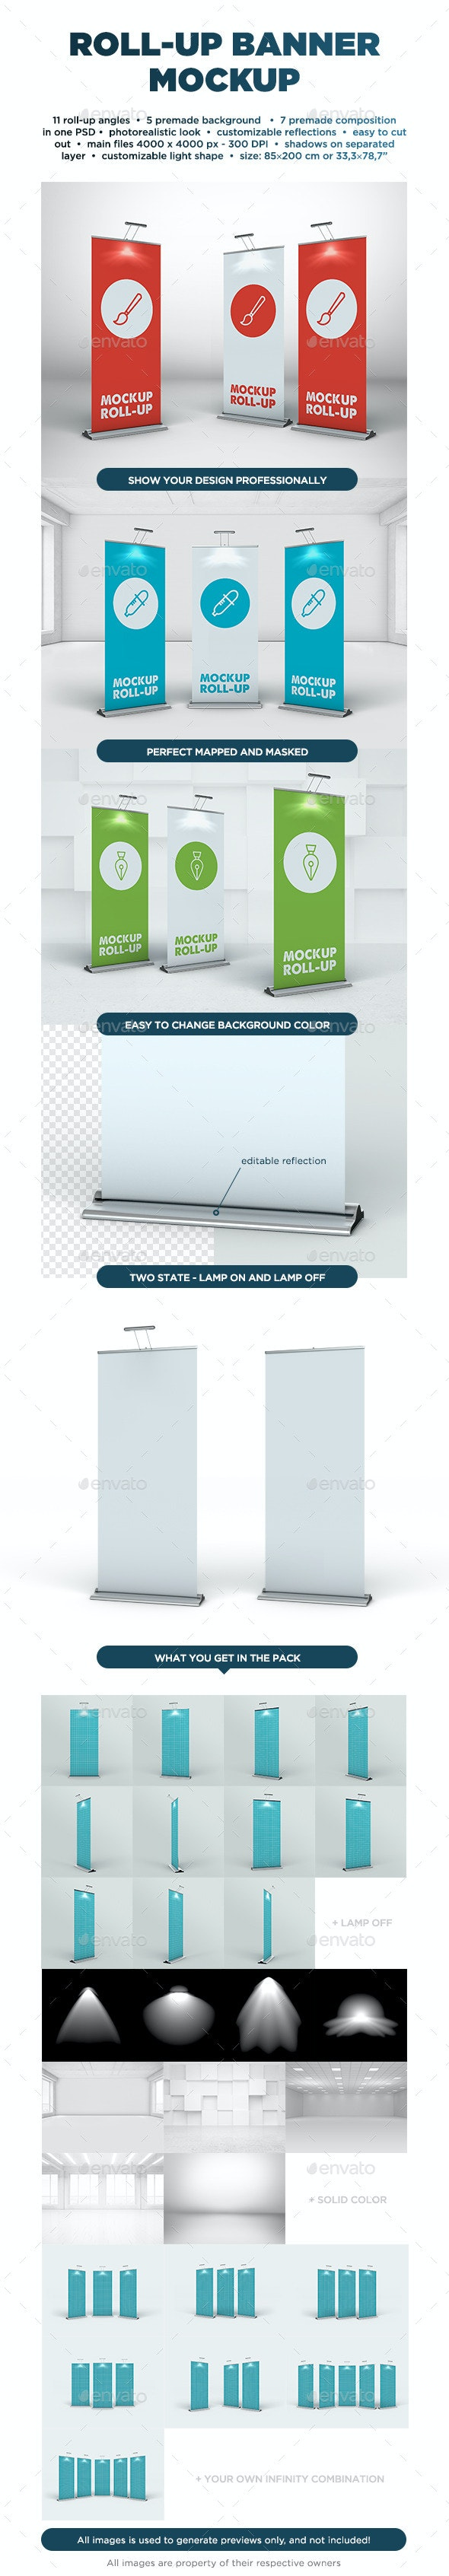 Roll Up Banner Mockup - Signage Print